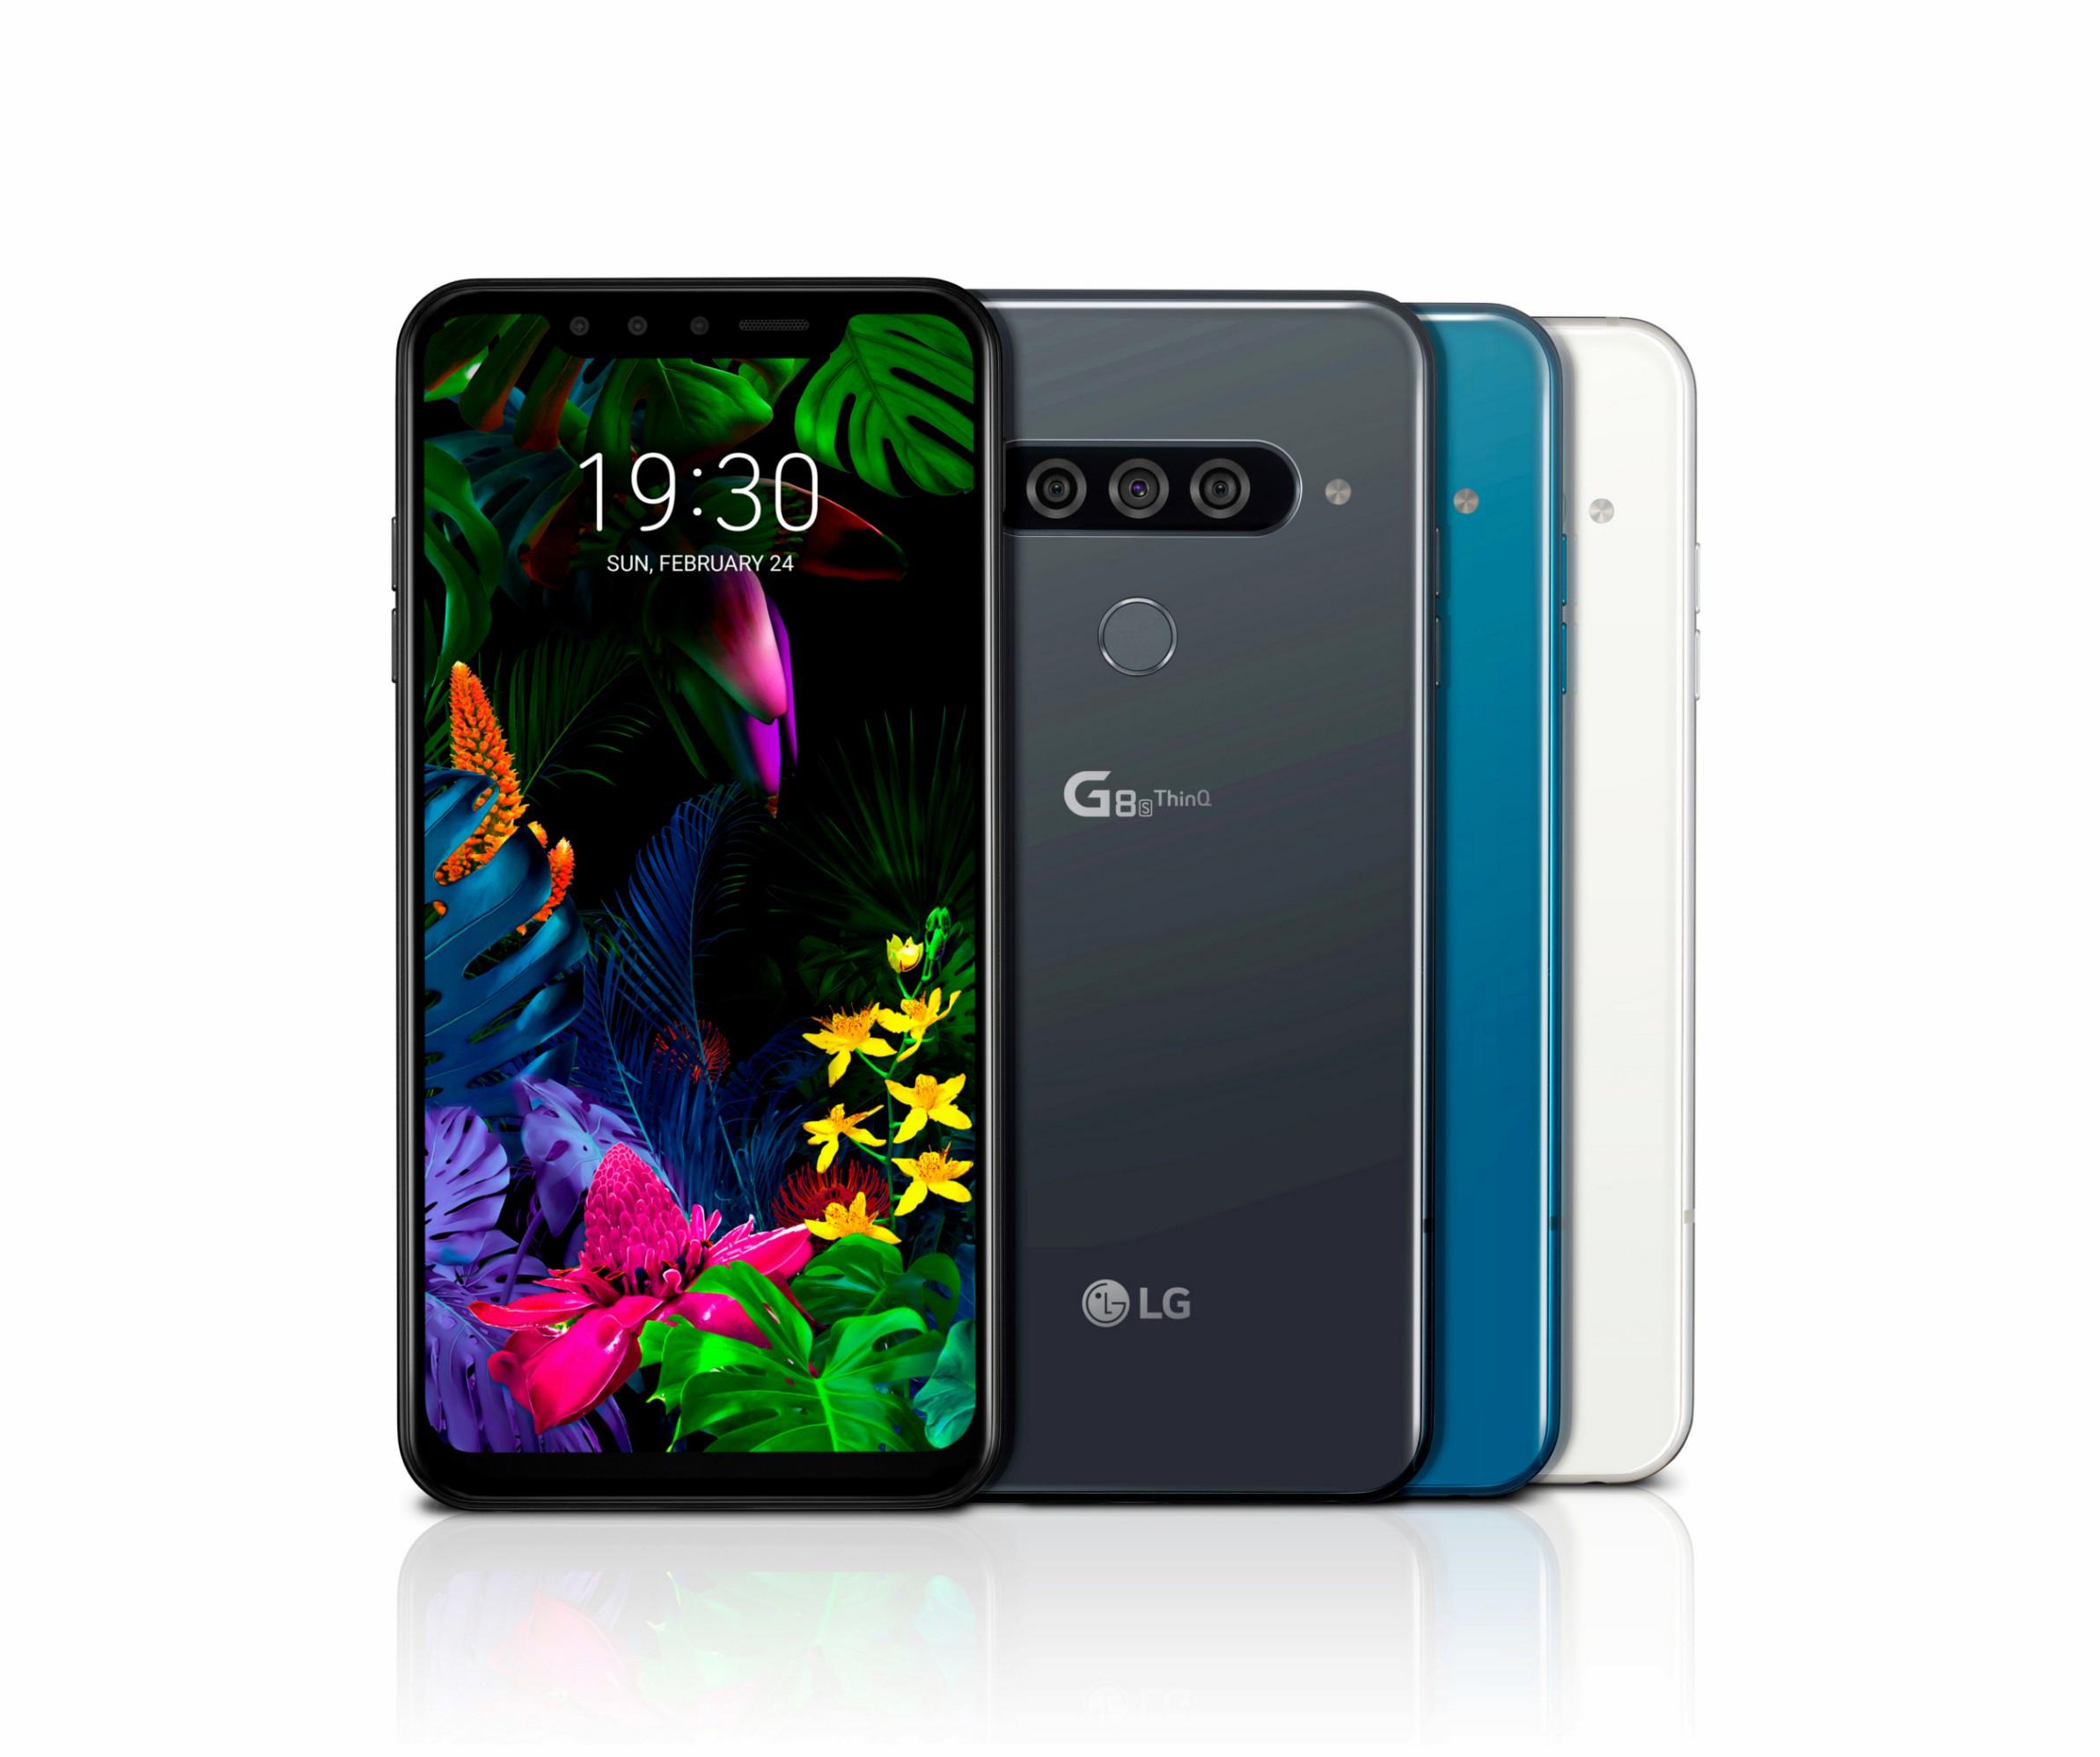 LG G8 comes to Verizon April 11